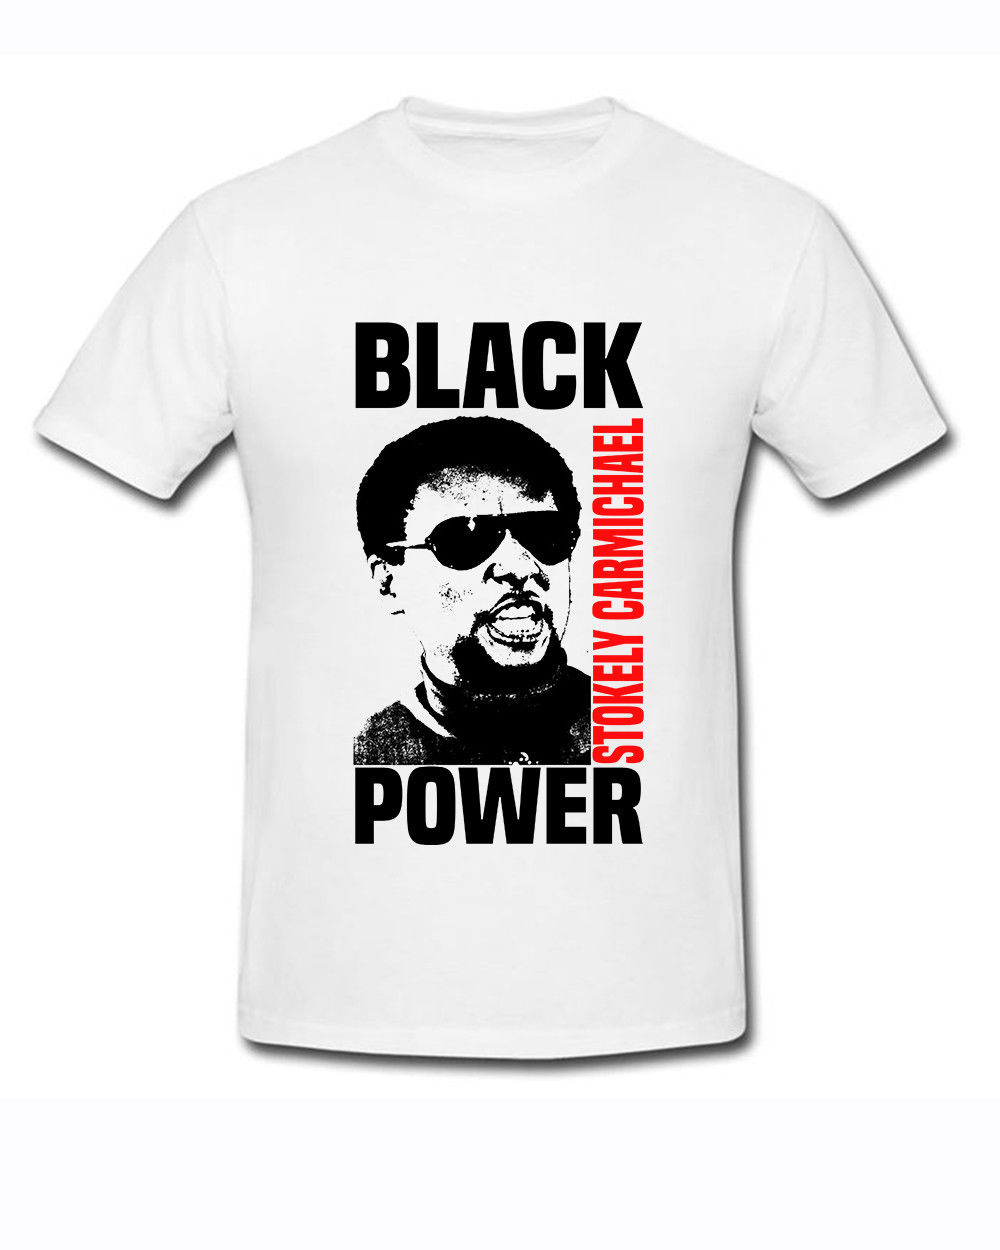 Funny Shirts Crew Neck Short-Sleeve Stokely Carmichael-Black Power Gildan white Men T-shirt size S-2XL